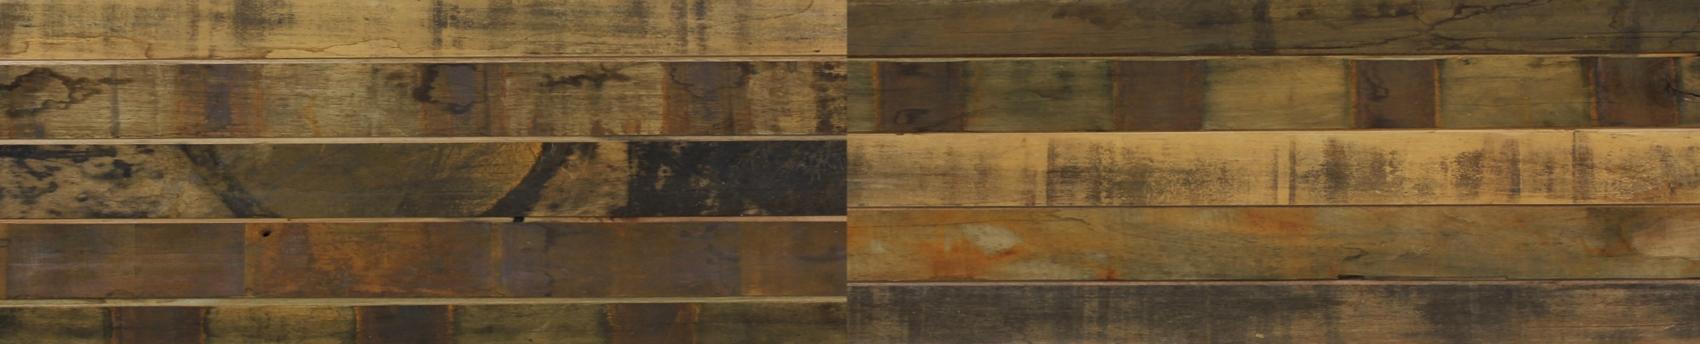 tumblr_static_reclaimed-wood.jpg